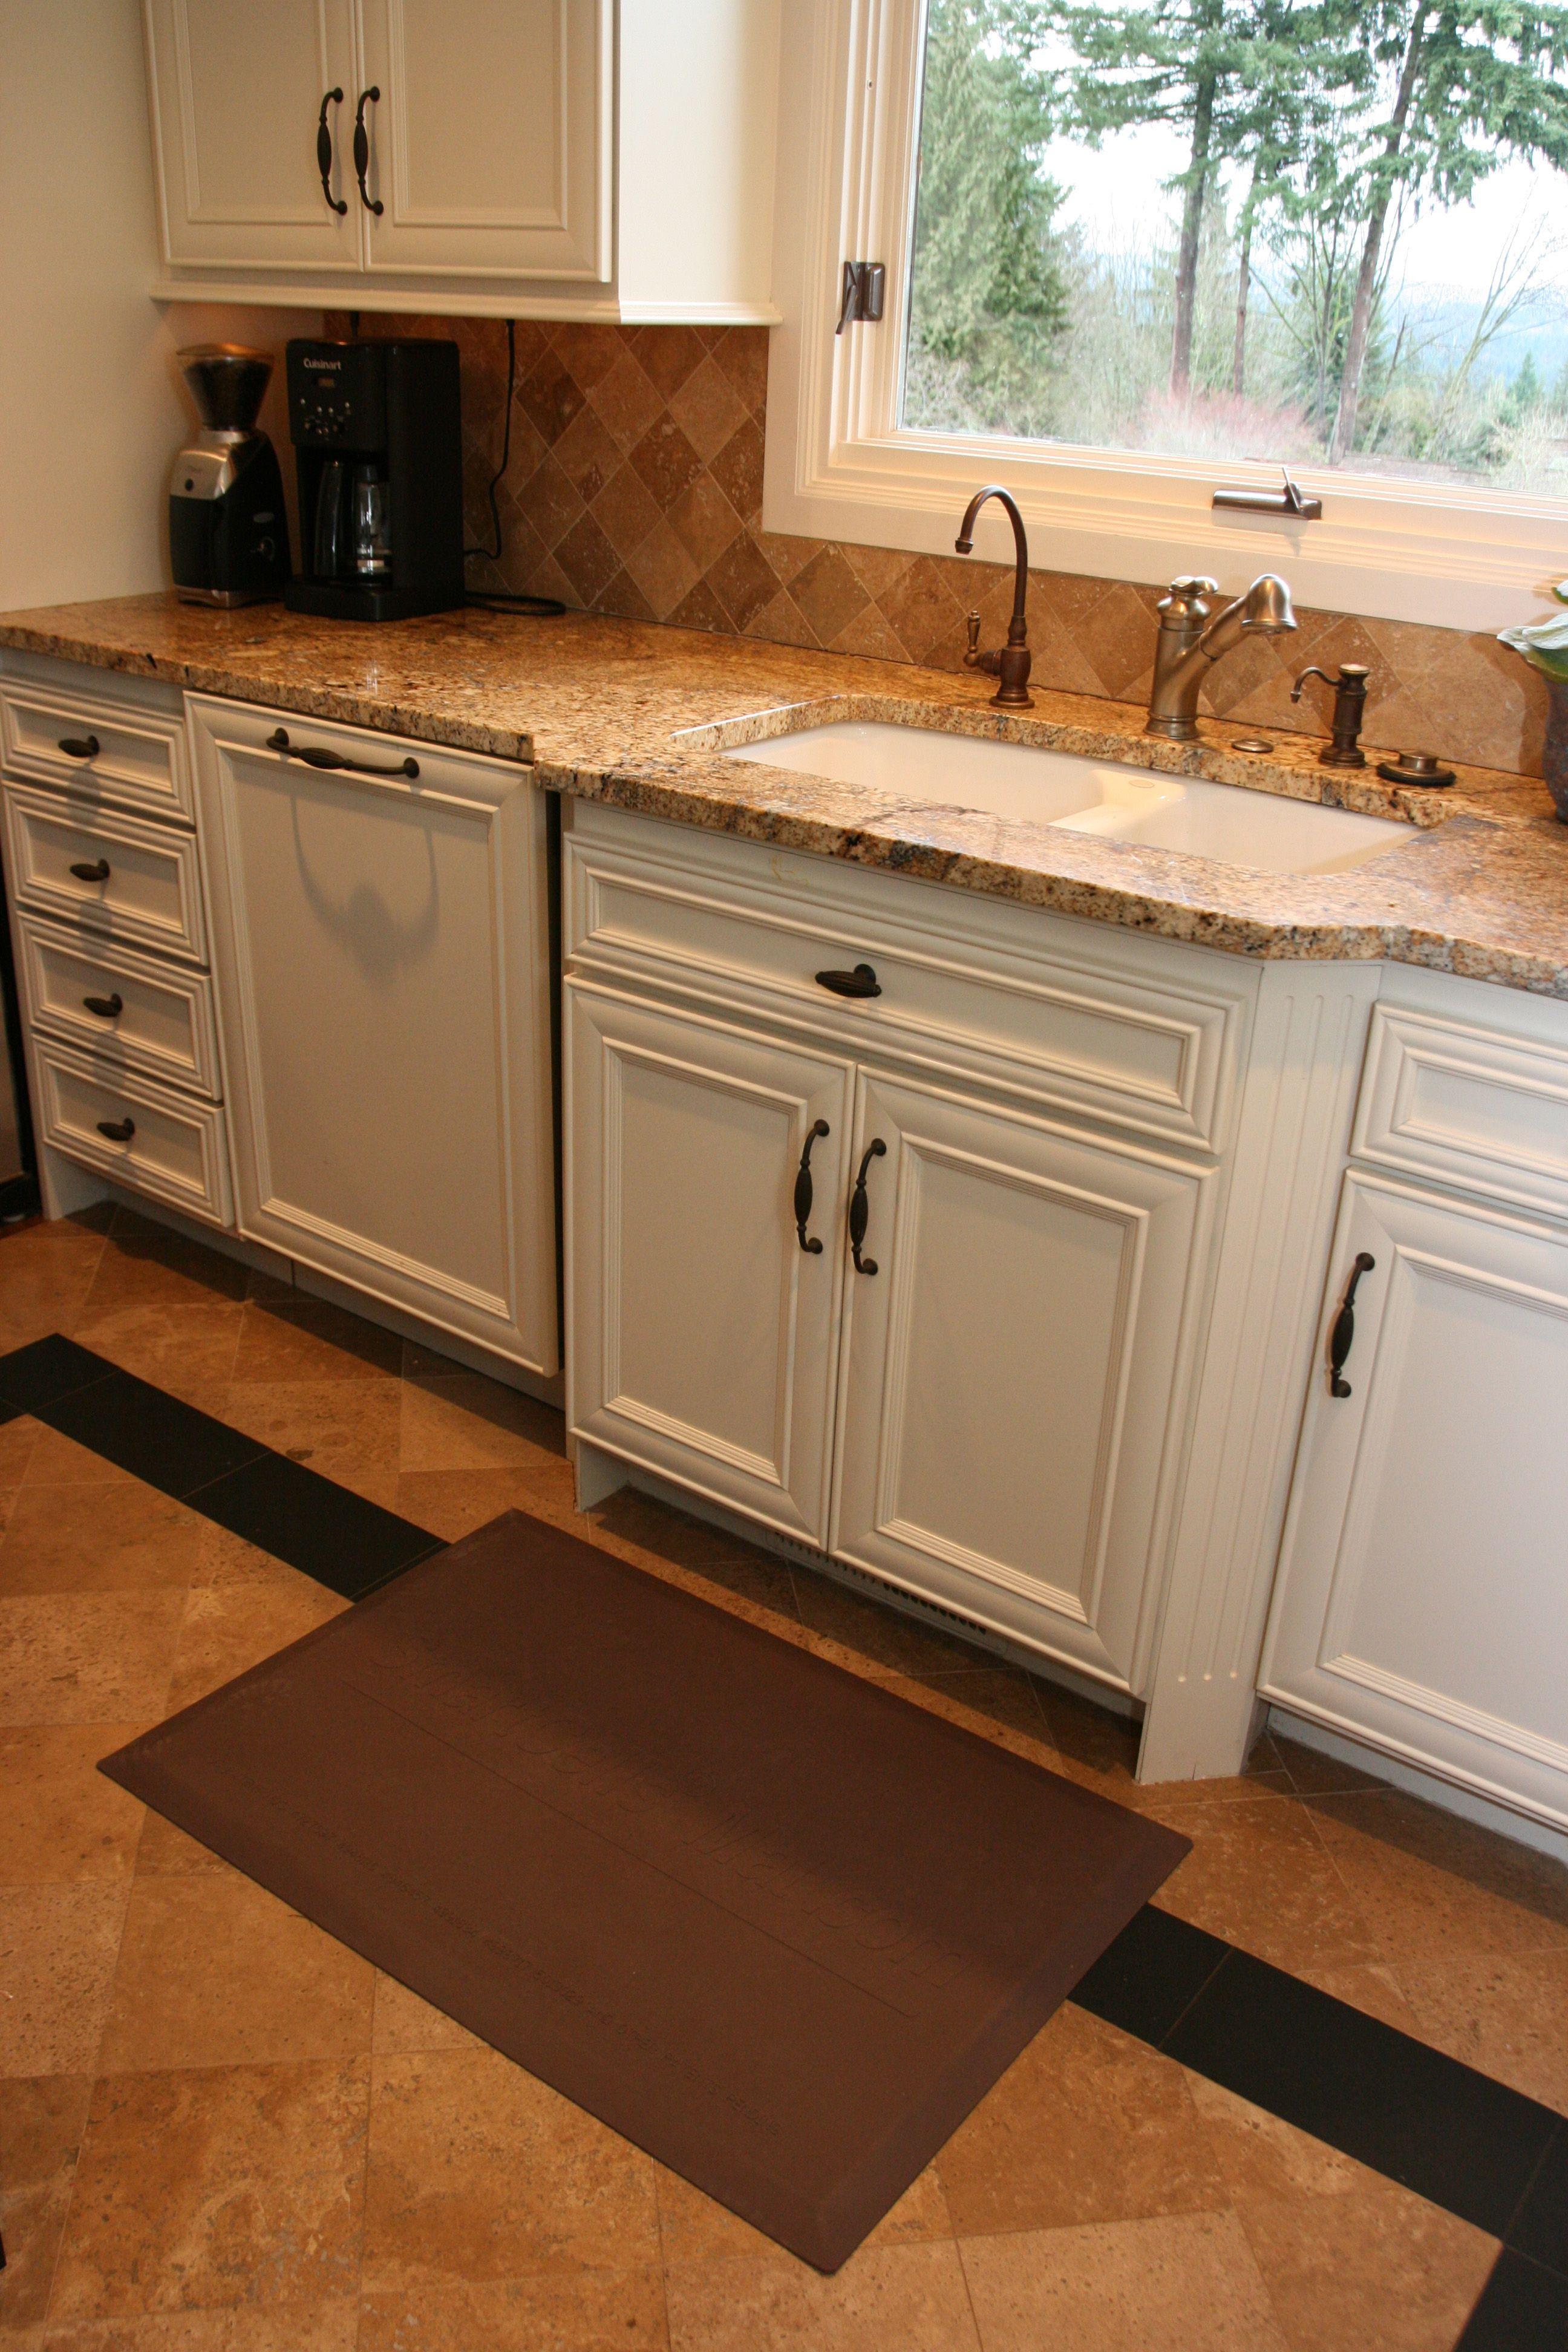 Anti Fatigue Mats Flooring Home Kitchens Kitchen Remodel Dream Kitchen